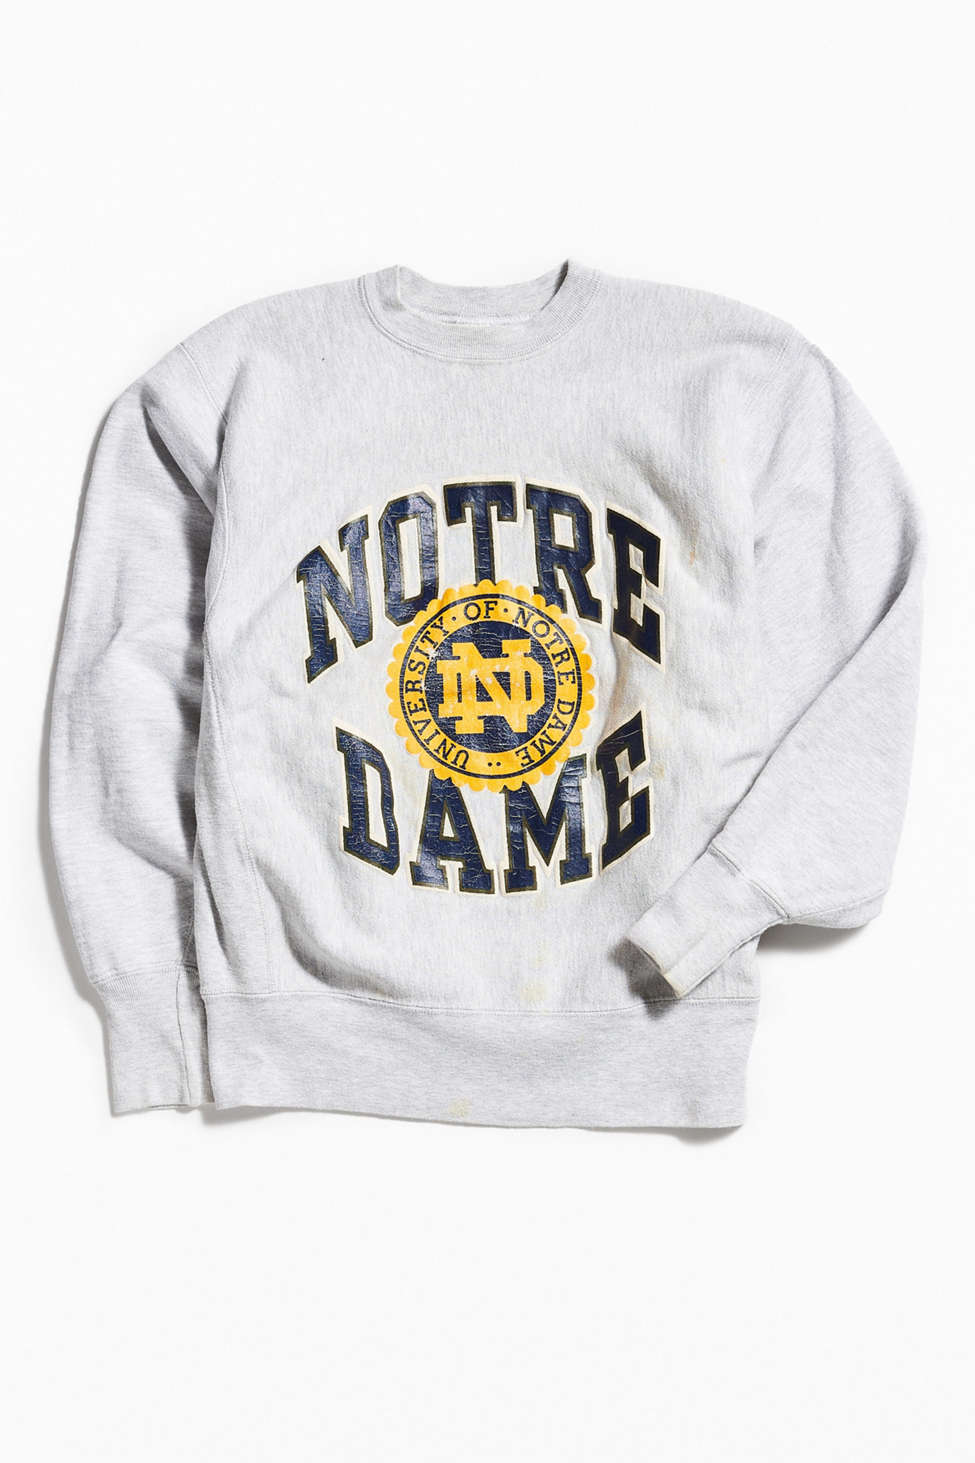 Vintage Champion Notre Dame Crew Neck Sweatshirt Urban Outfitters